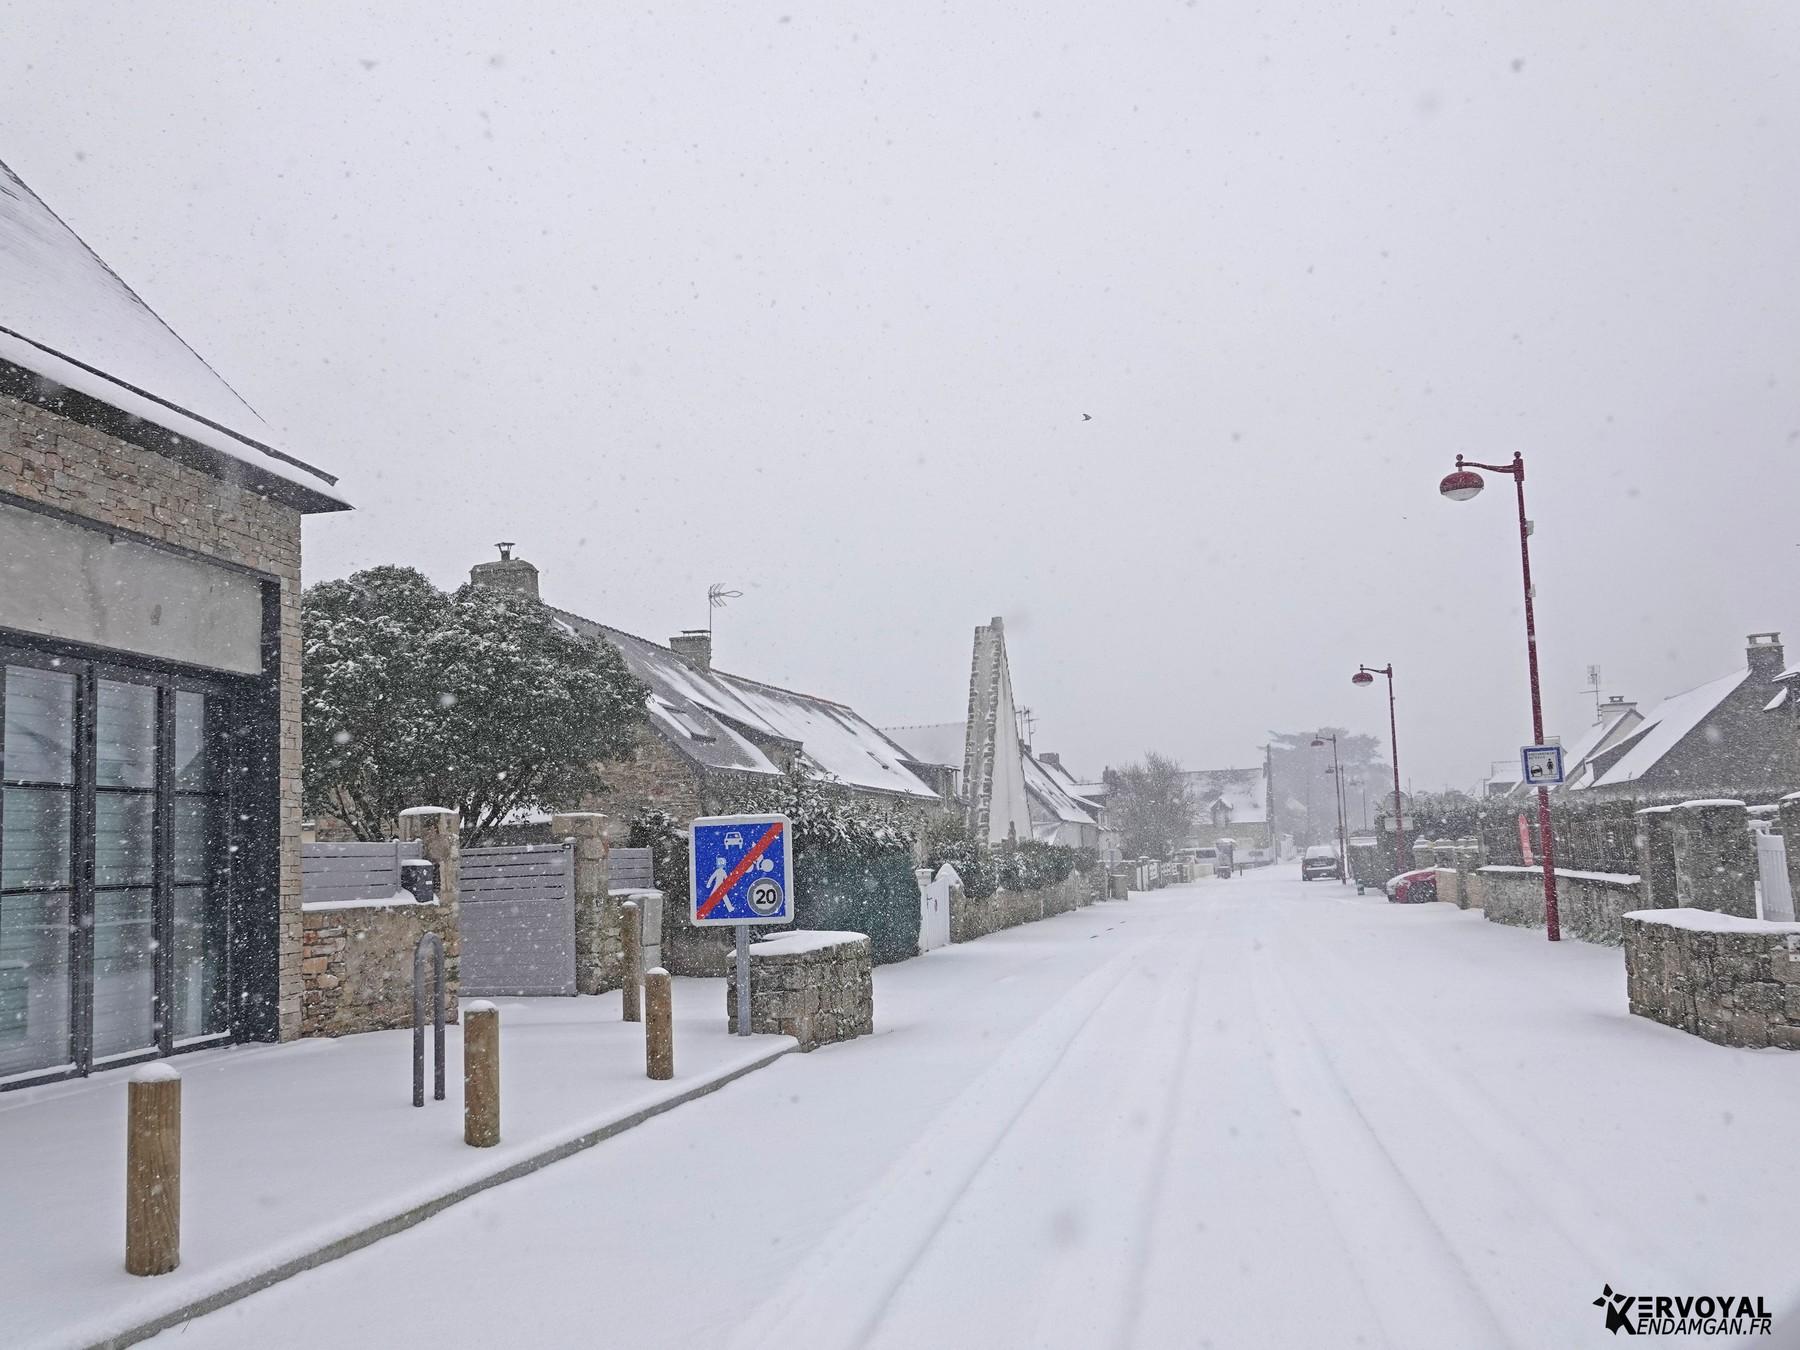 neige à kervoyal 11 février 2021 damgan morbihan (31)